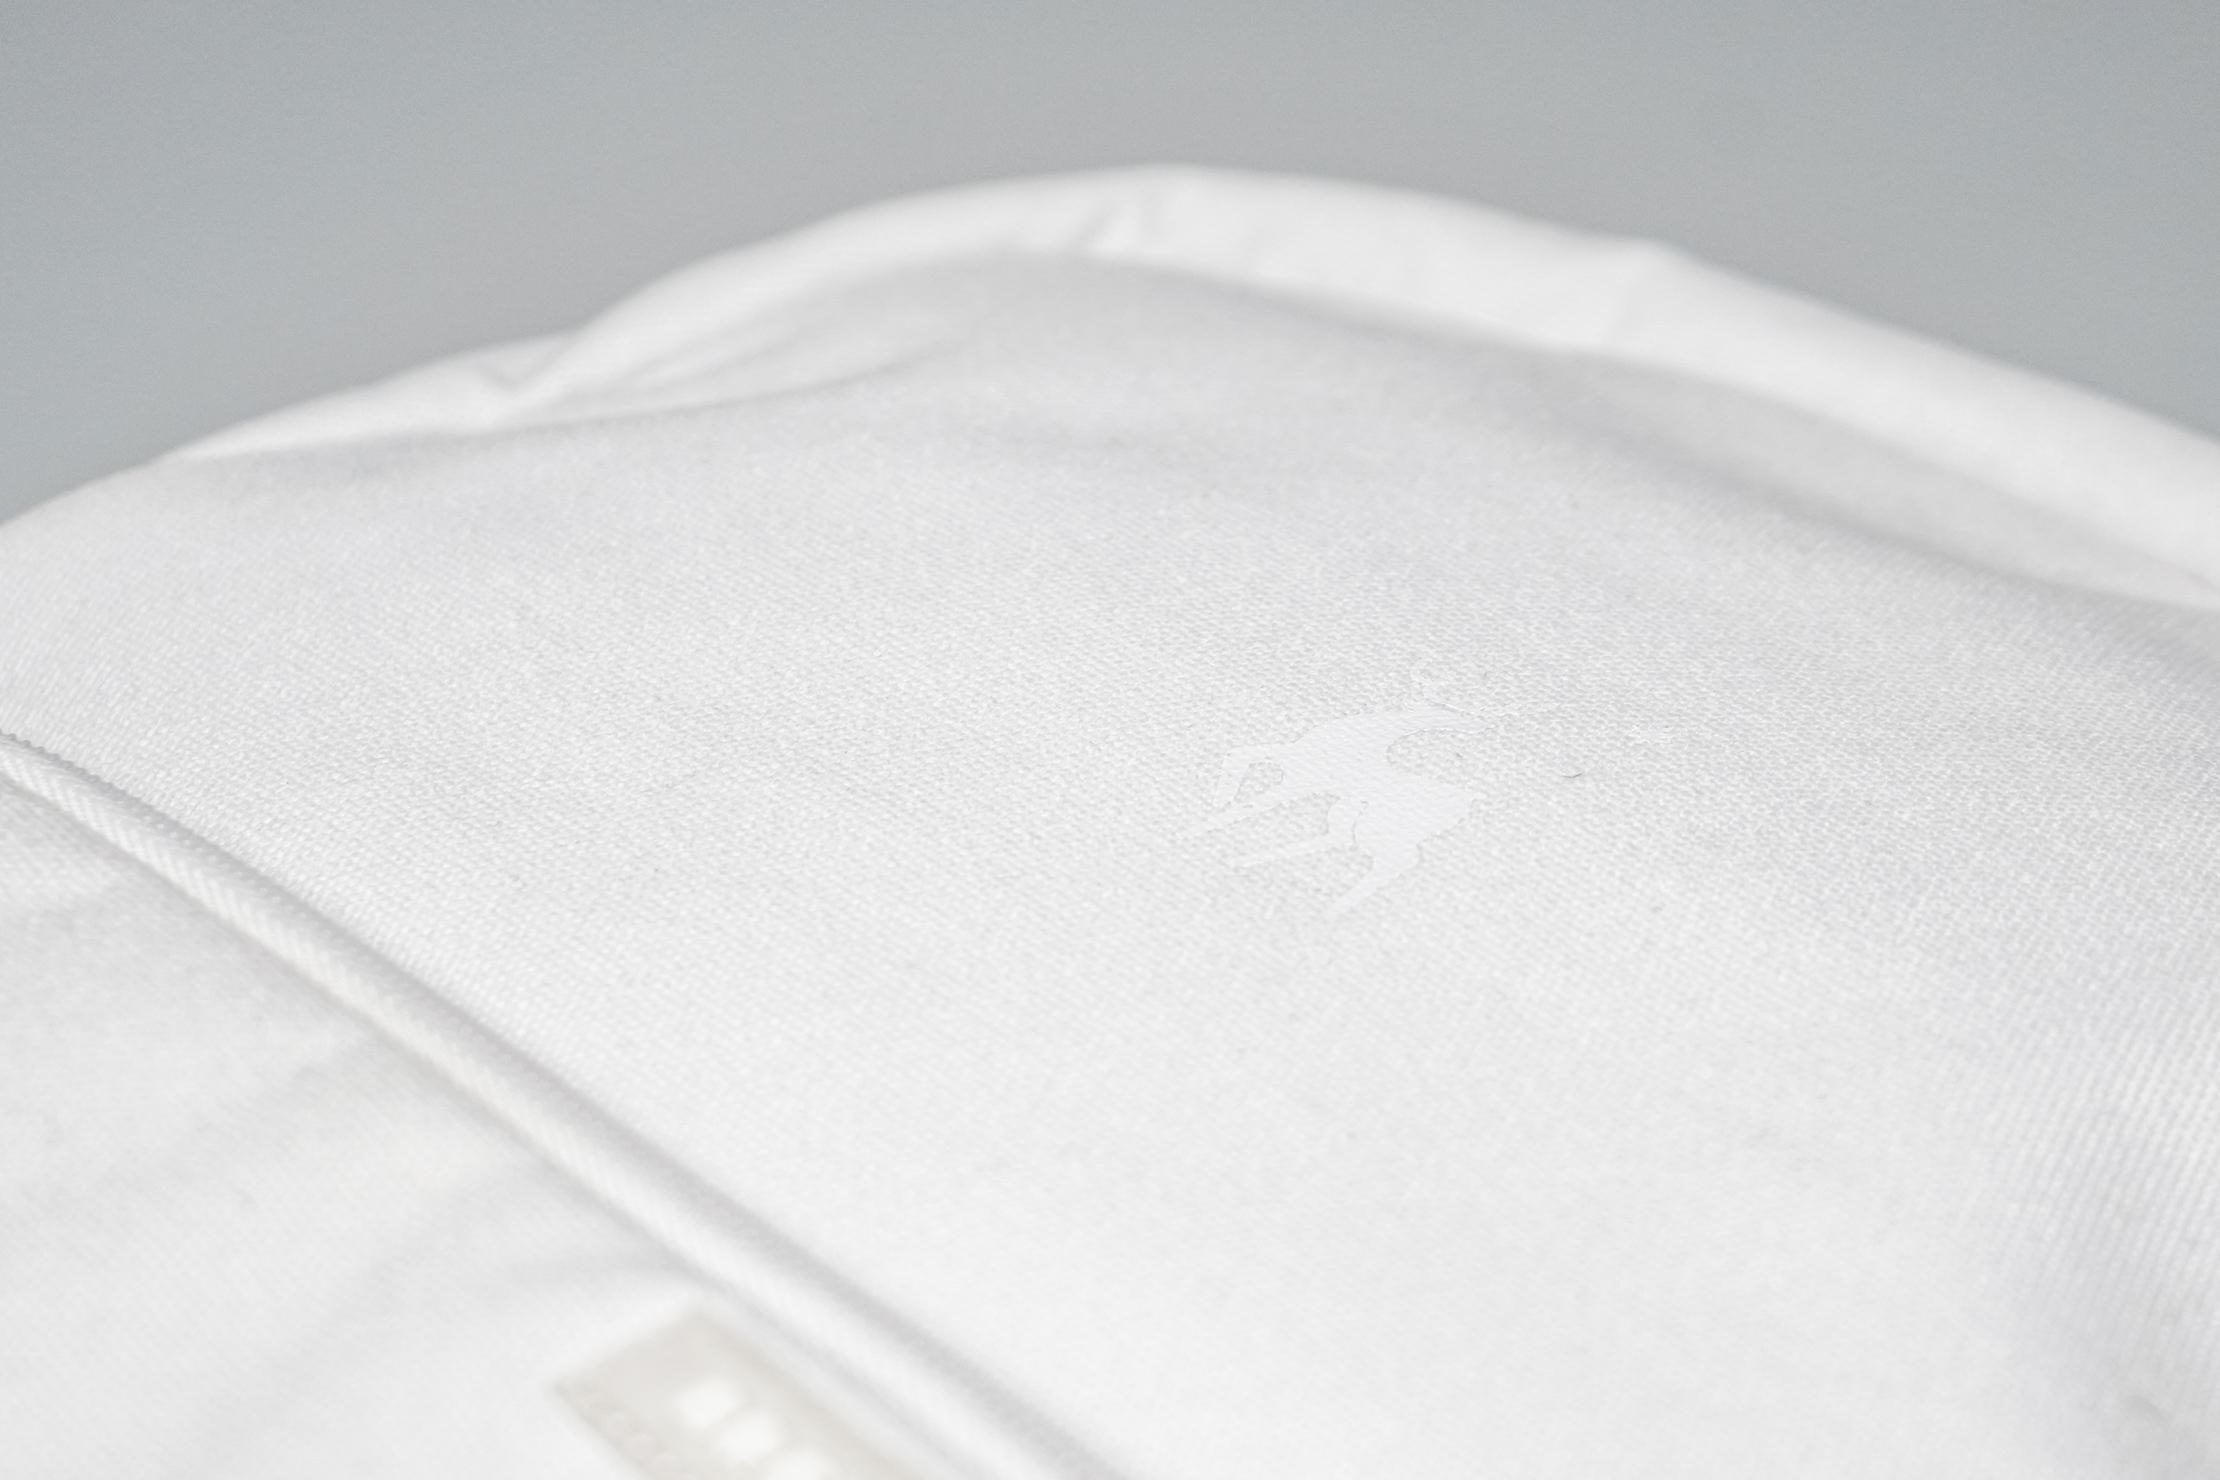 Brevitē Jumper Photo Backpack Material and Logo